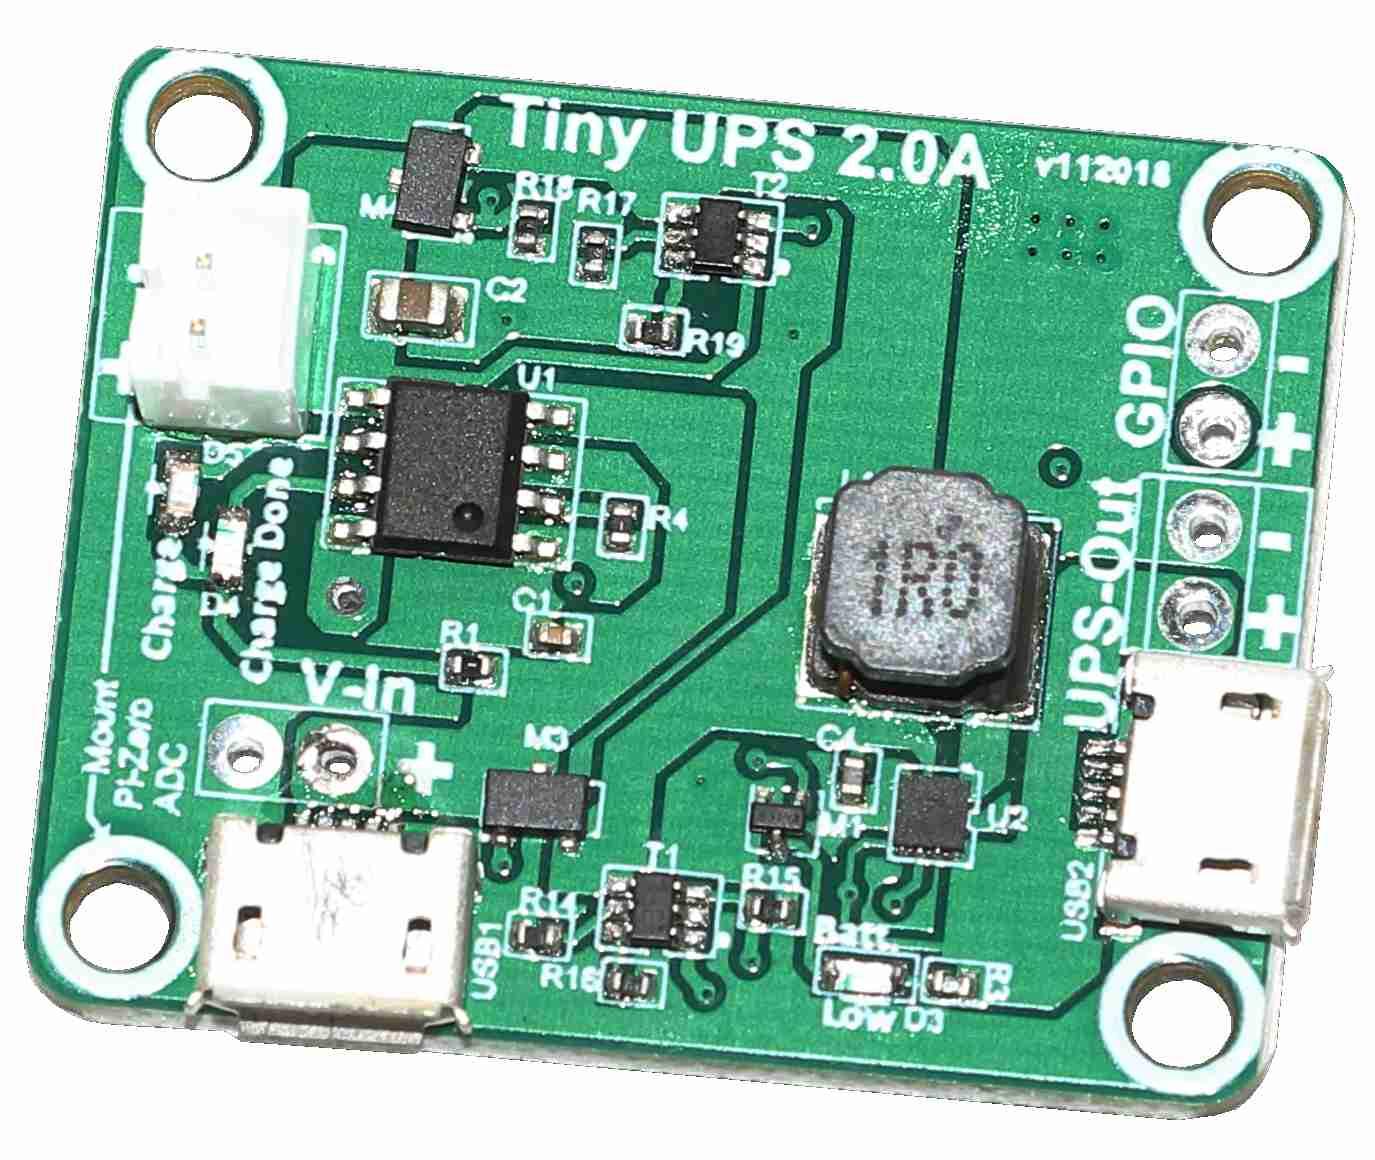 Tiny-UPS - Worlds tiniest UPS with GPIO indicator - Alchemy